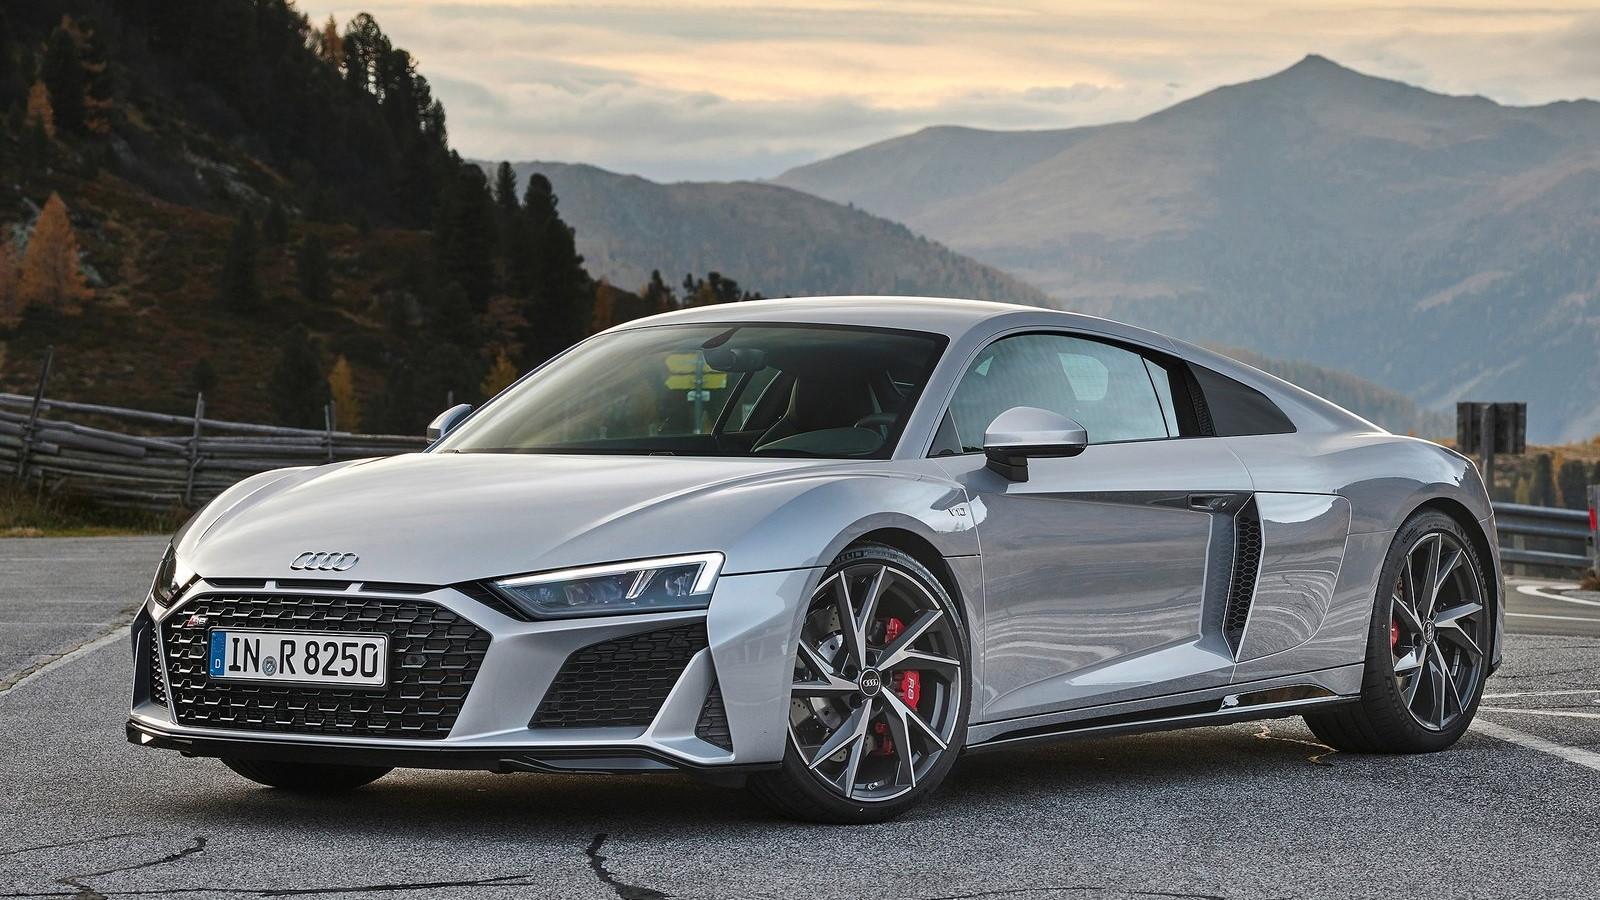 Audi-R8_V10_RWD-2020-1600-01